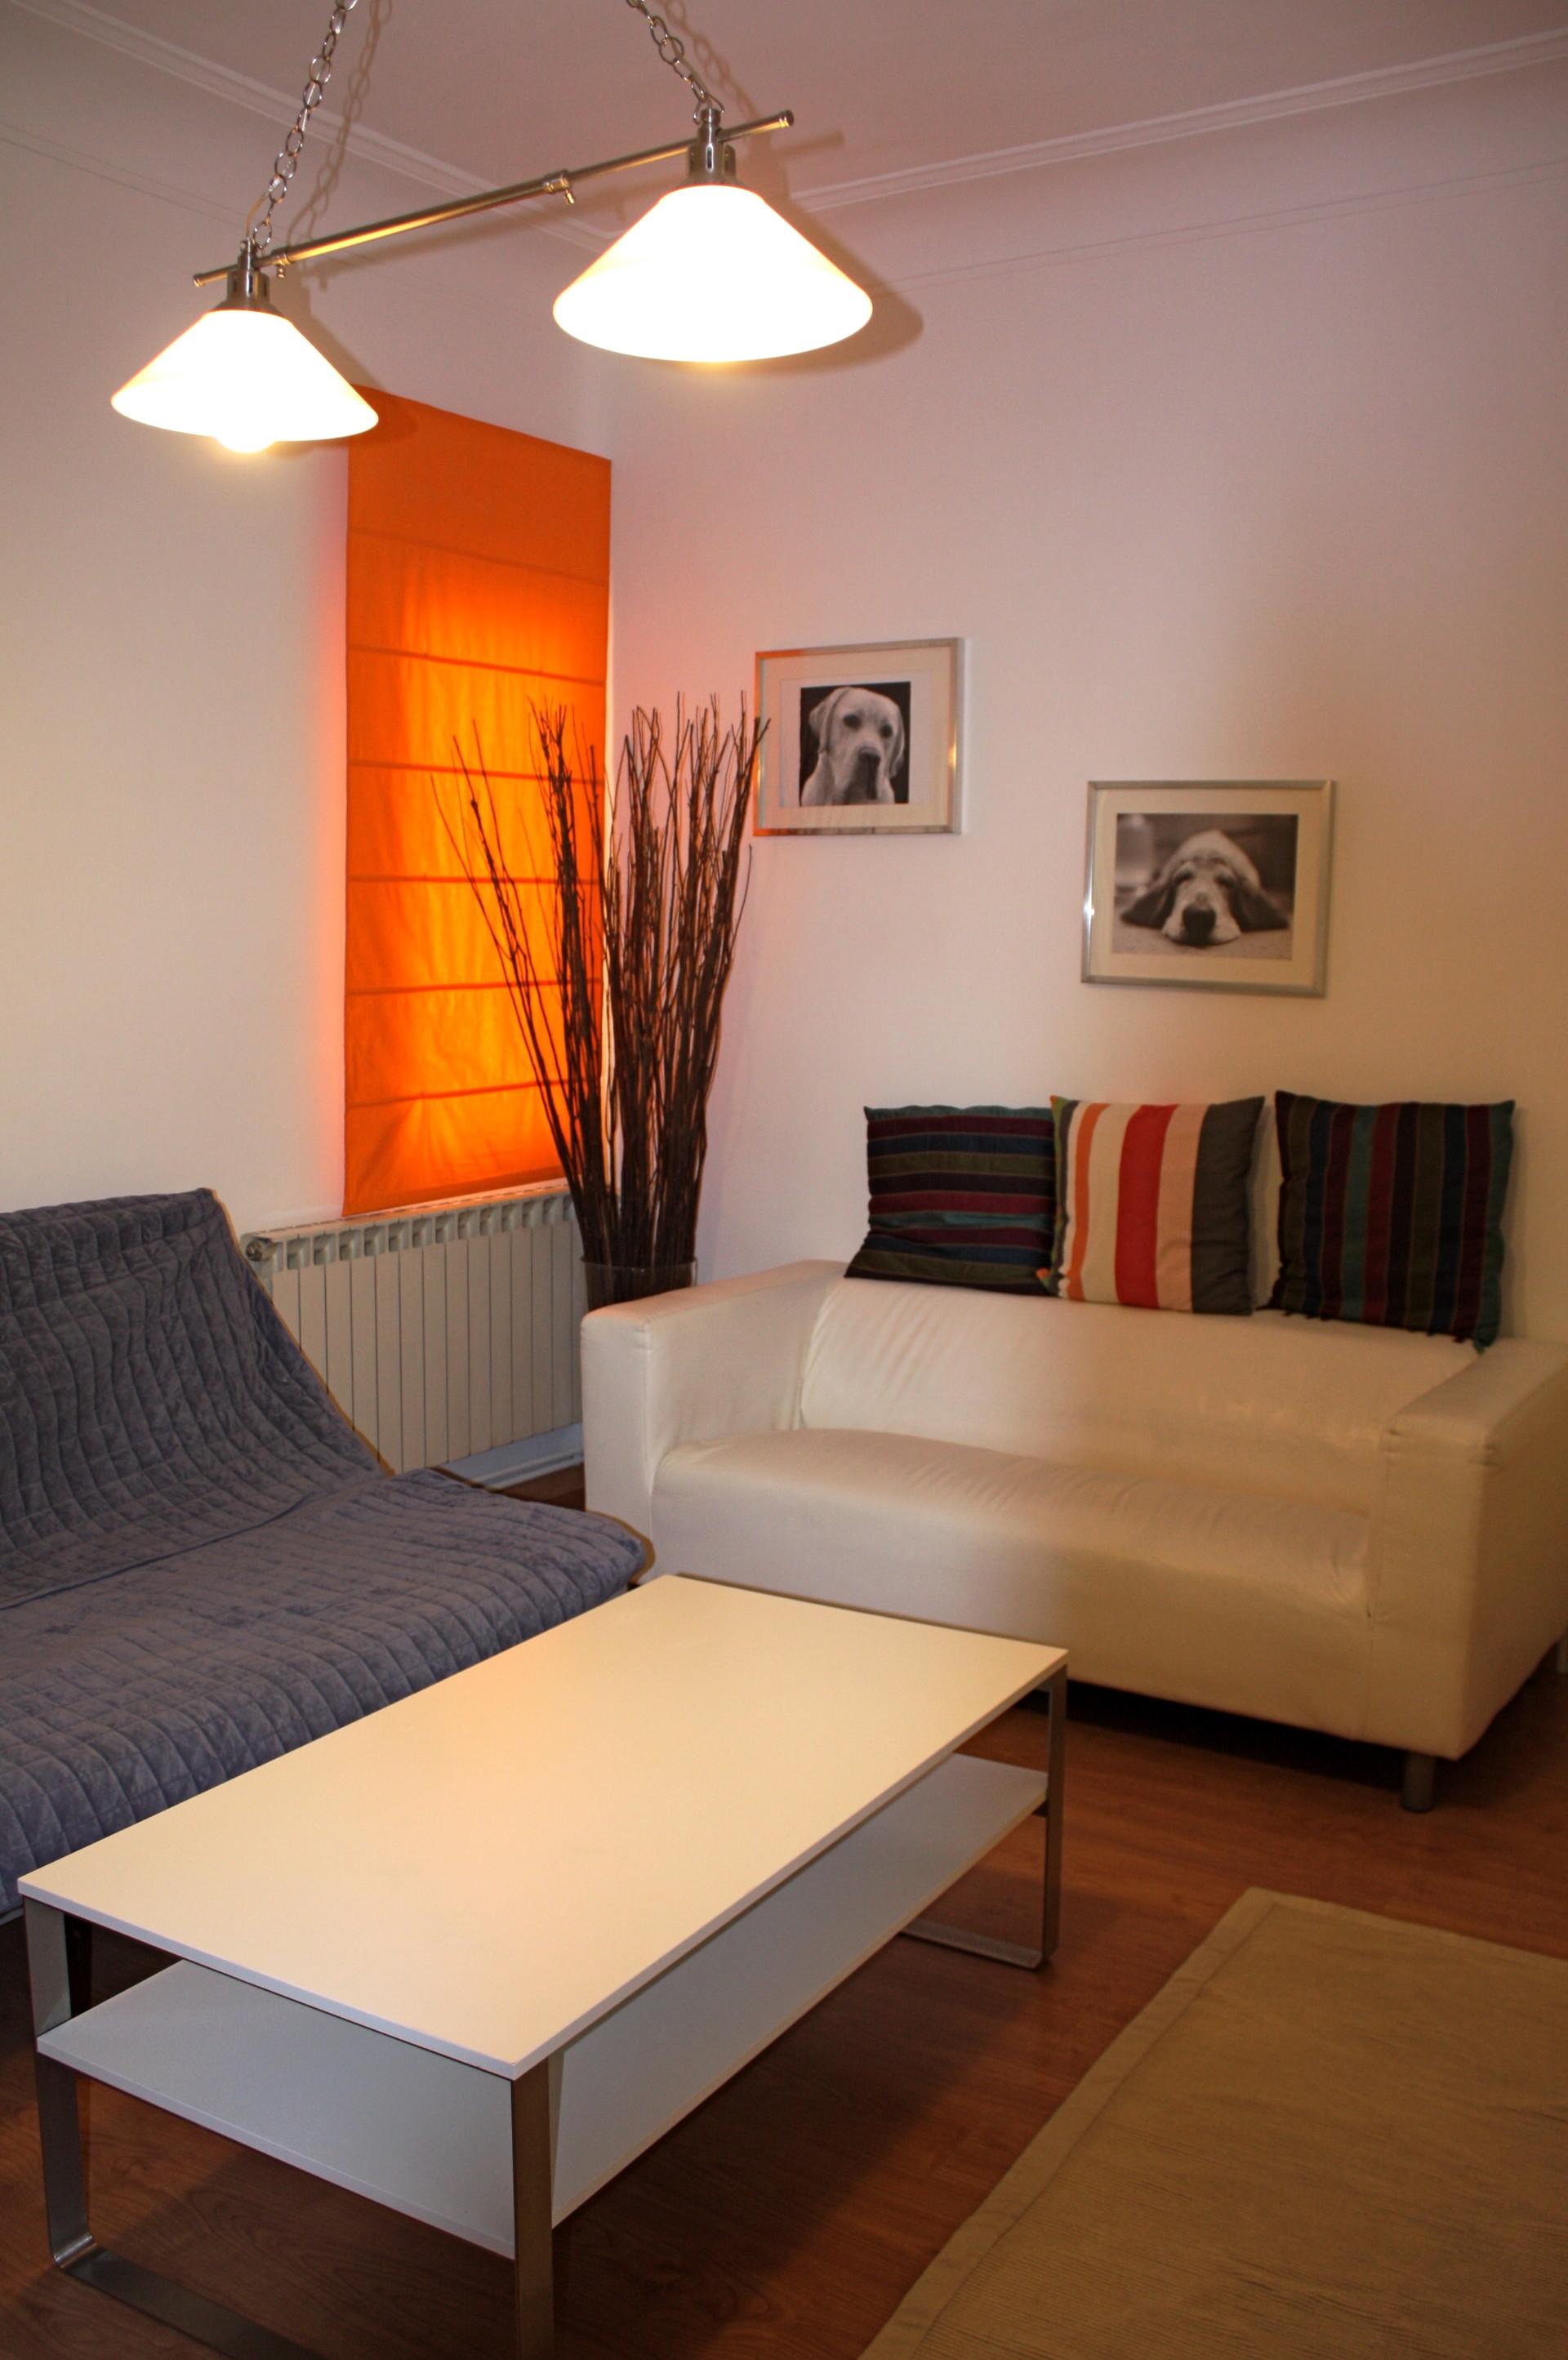 Alquiler De Habitaci N En Moderna Residencia De